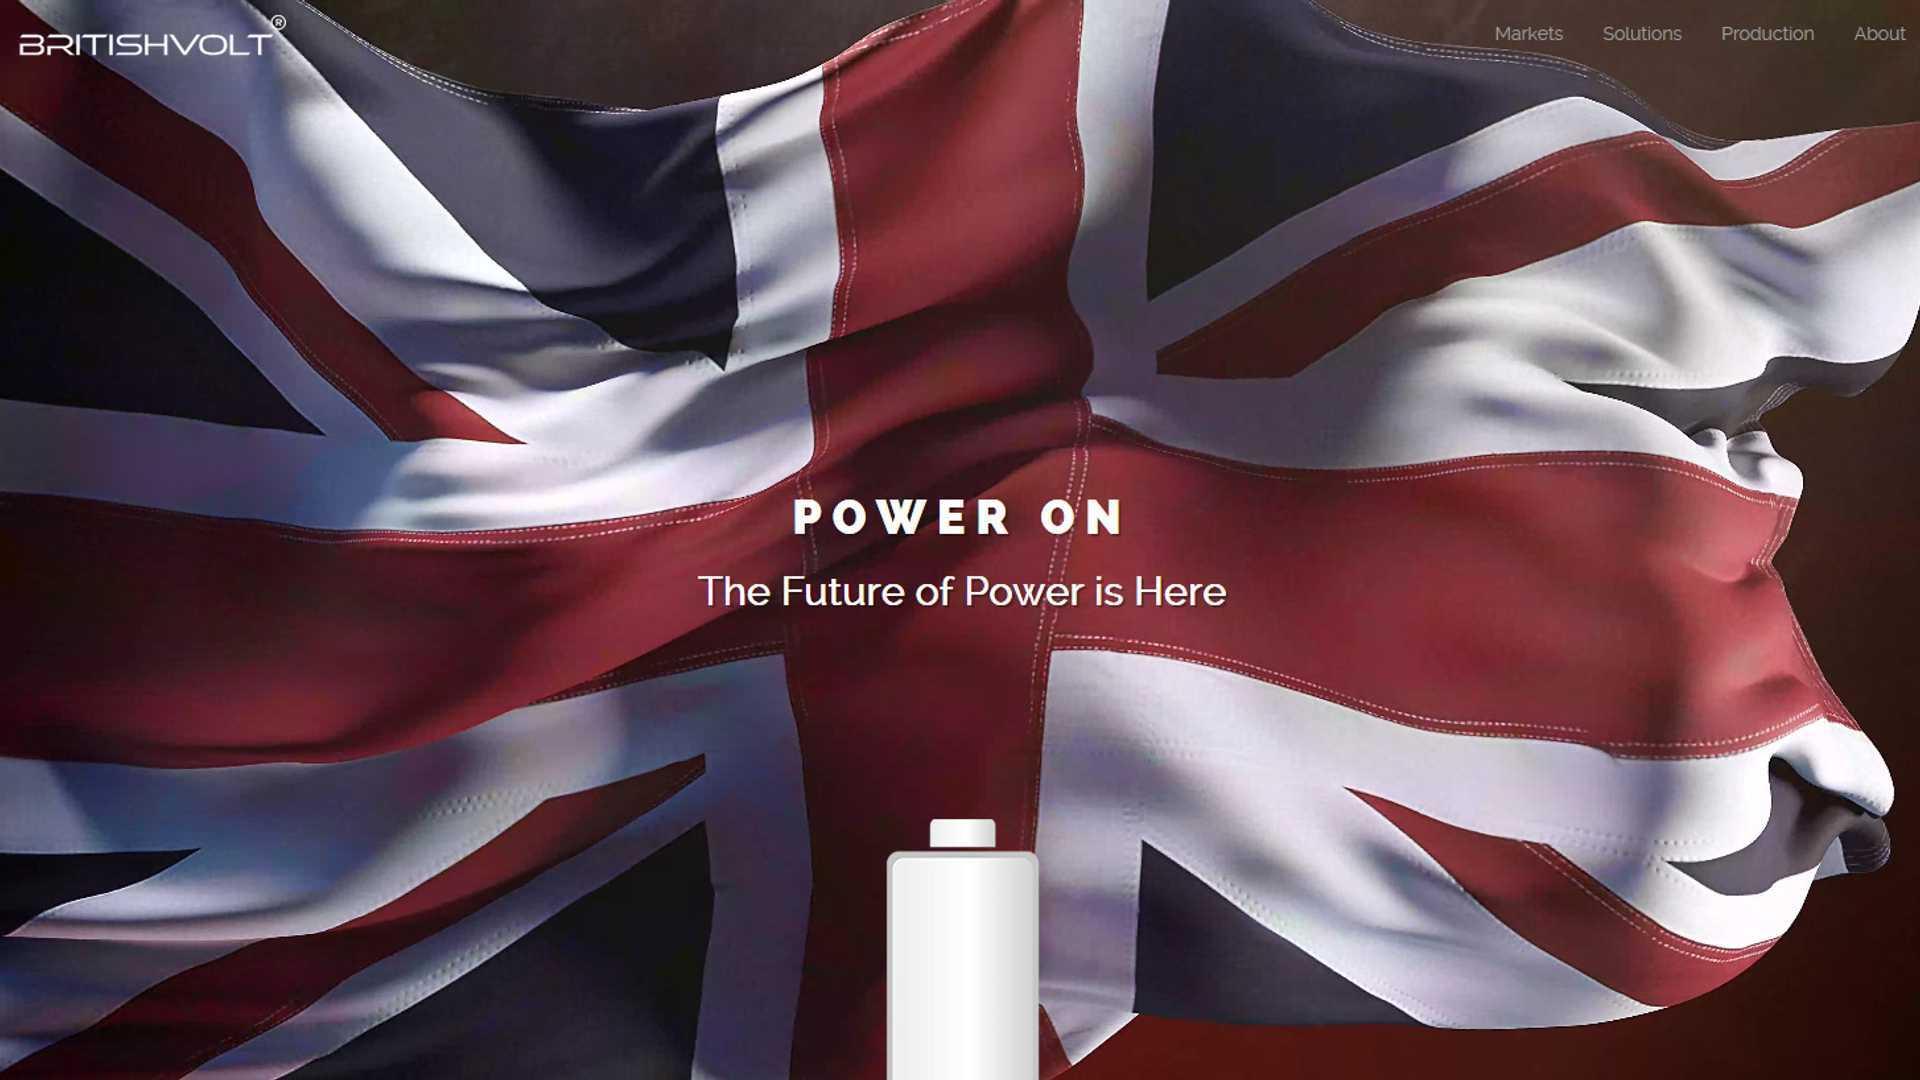 Britishvolt and AMTE Power outline plan for battery gigafactory in UK